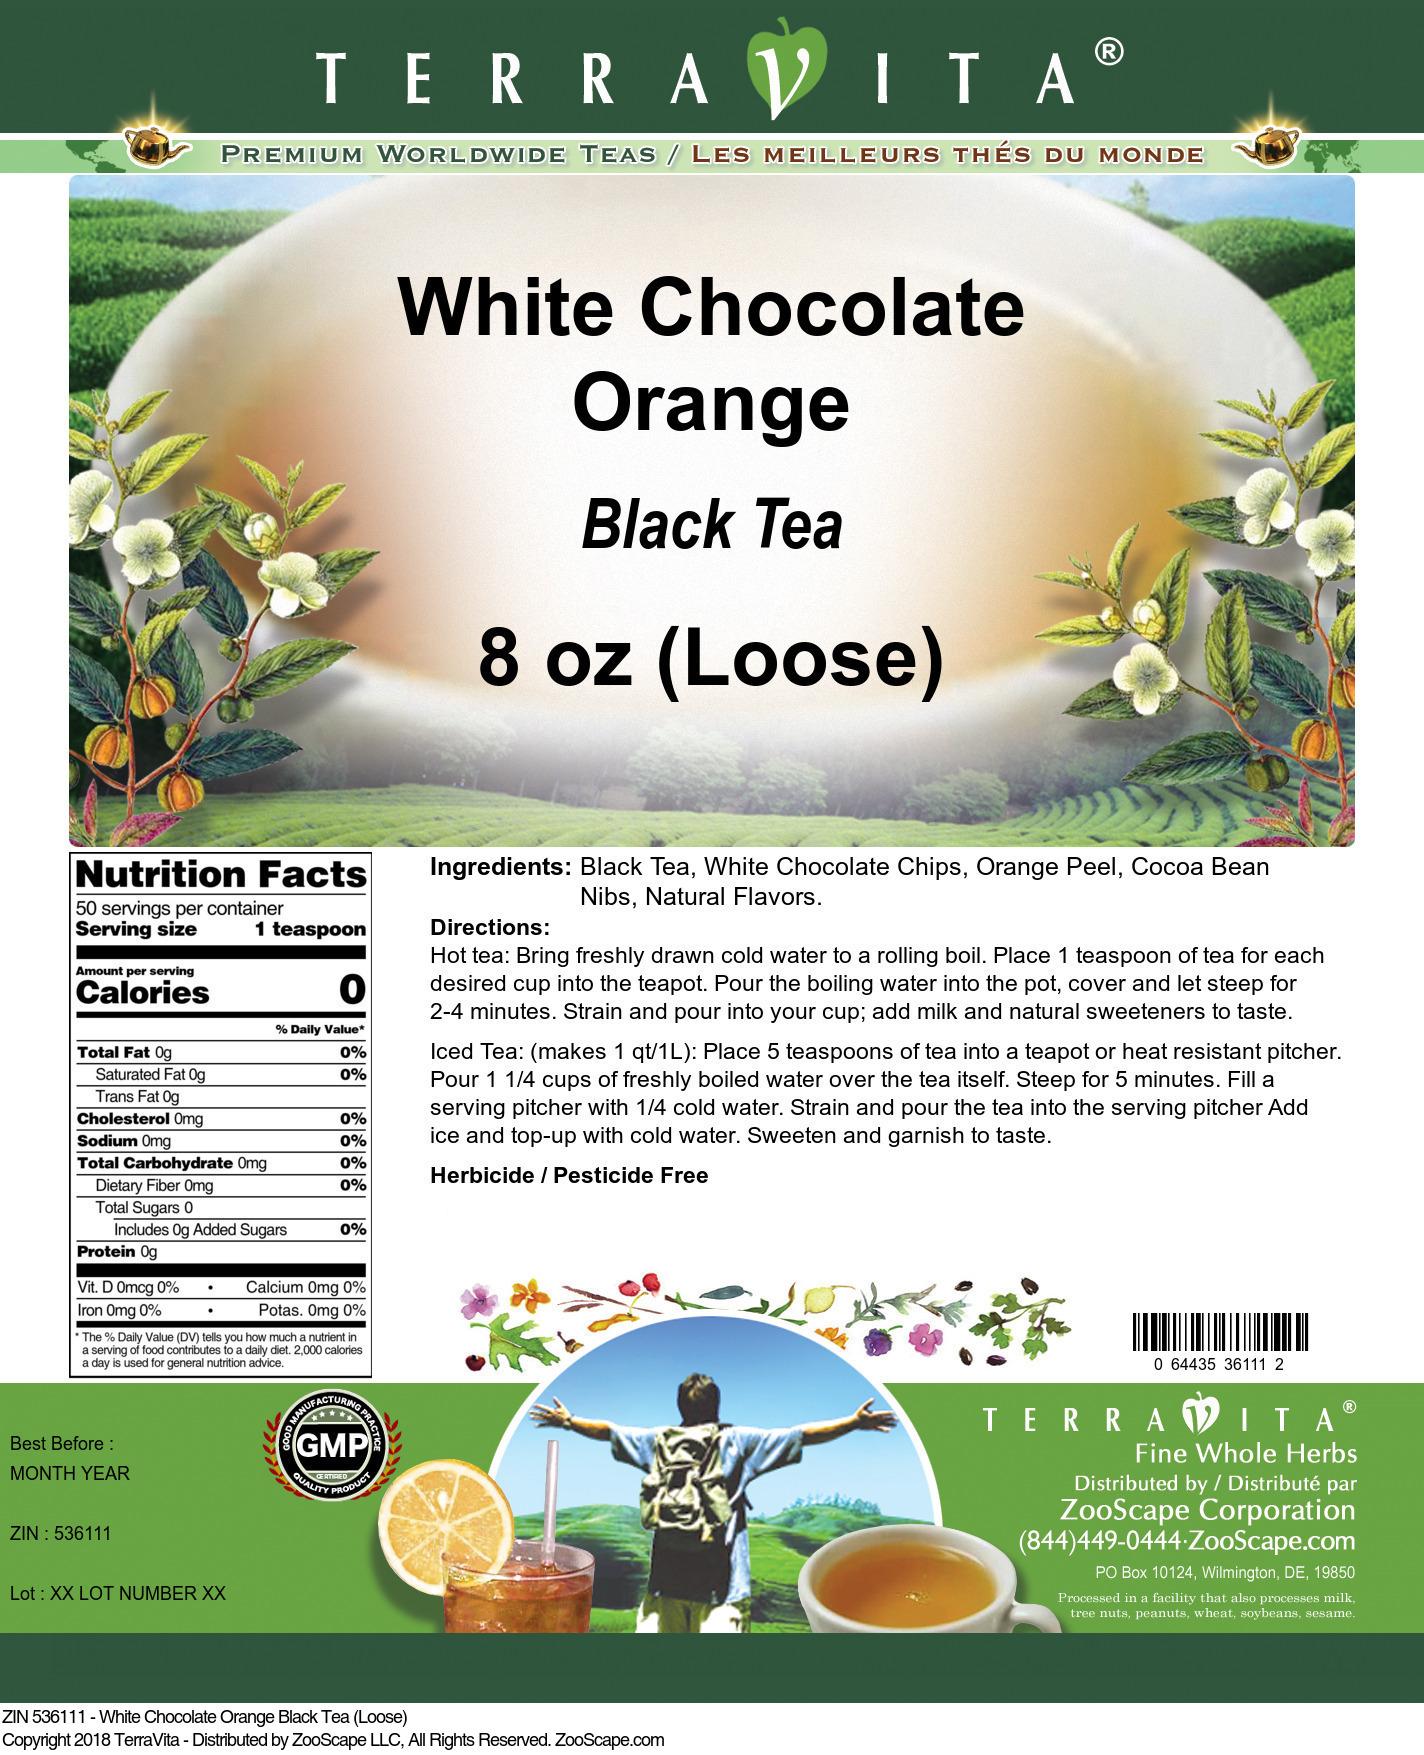 White Chocolate Orange Black Tea (Loose)